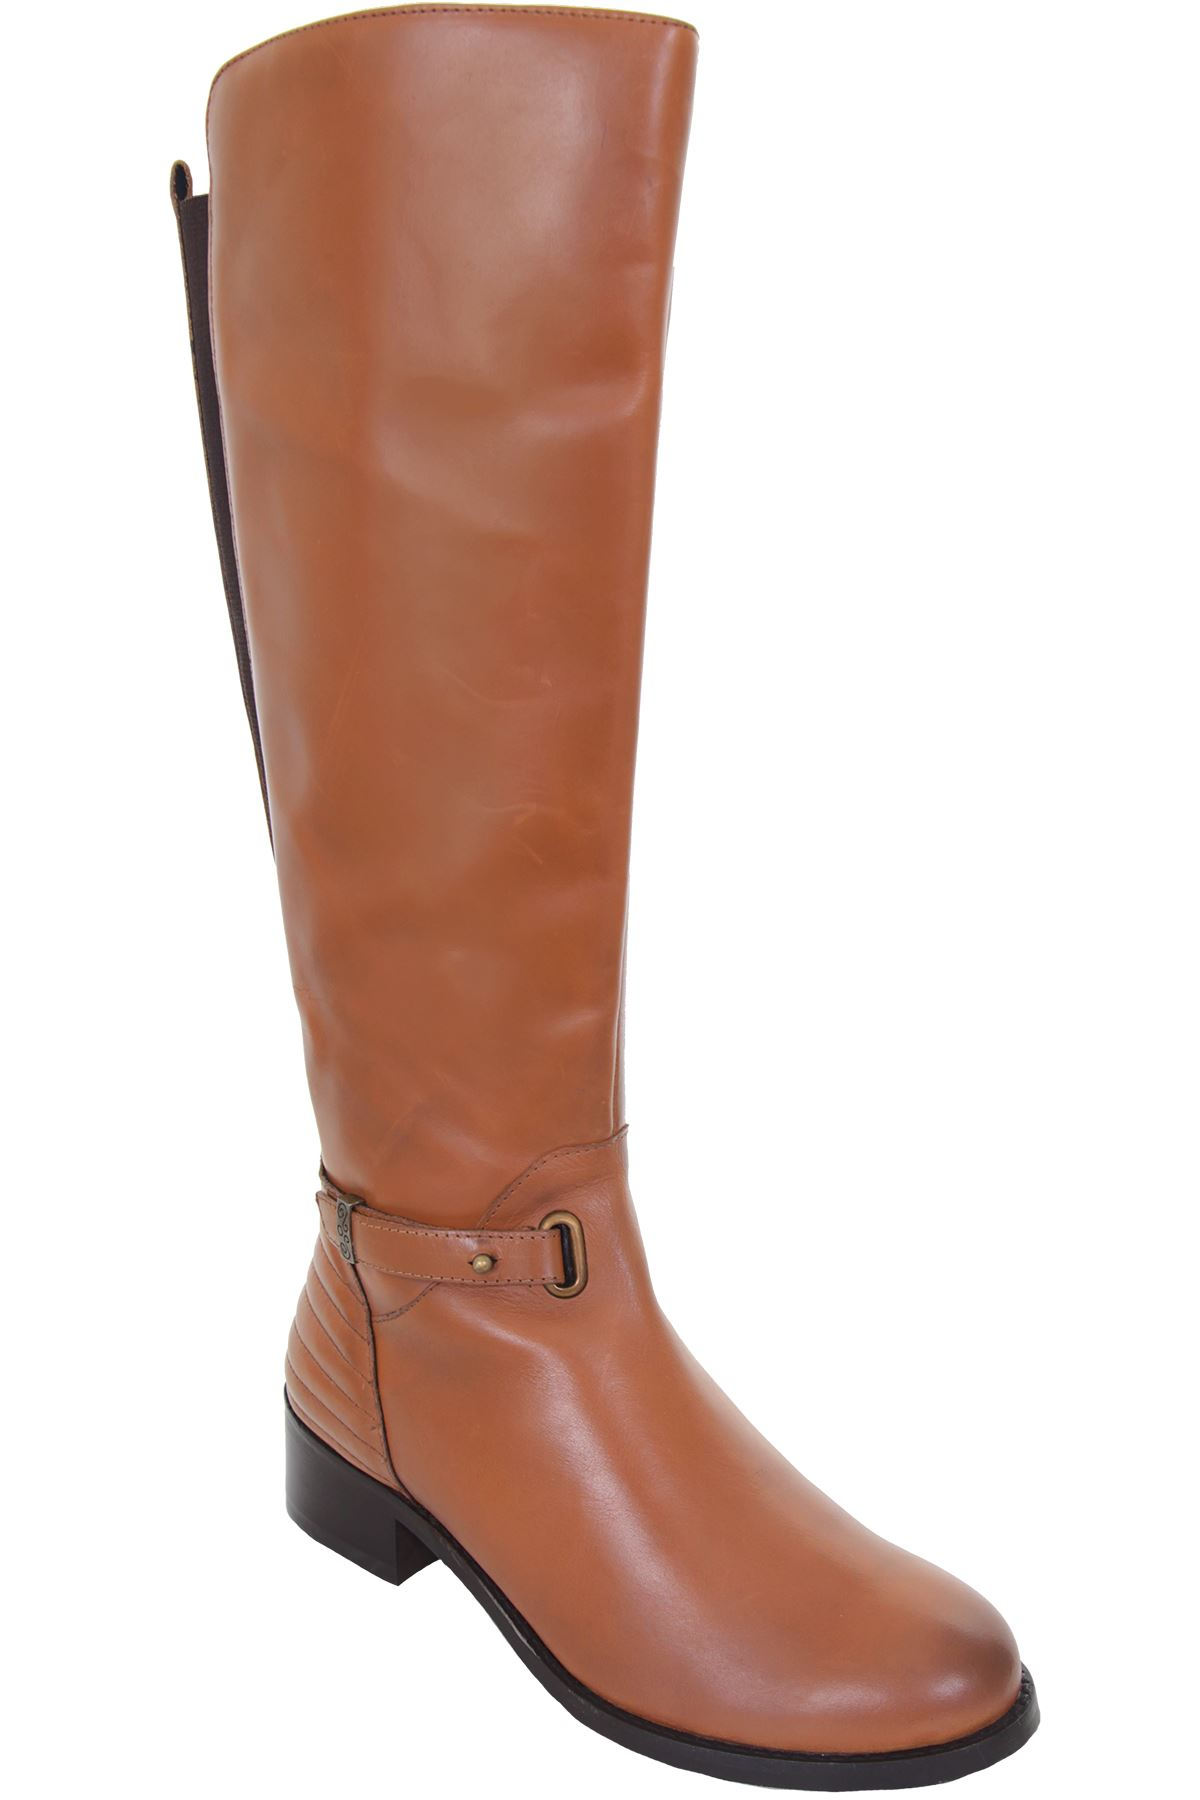 GLH472 Renoir Calf Calf Calf High Zipper Side Elasticated Niedrig Heel Genuine Leder Stiefel 09cd14